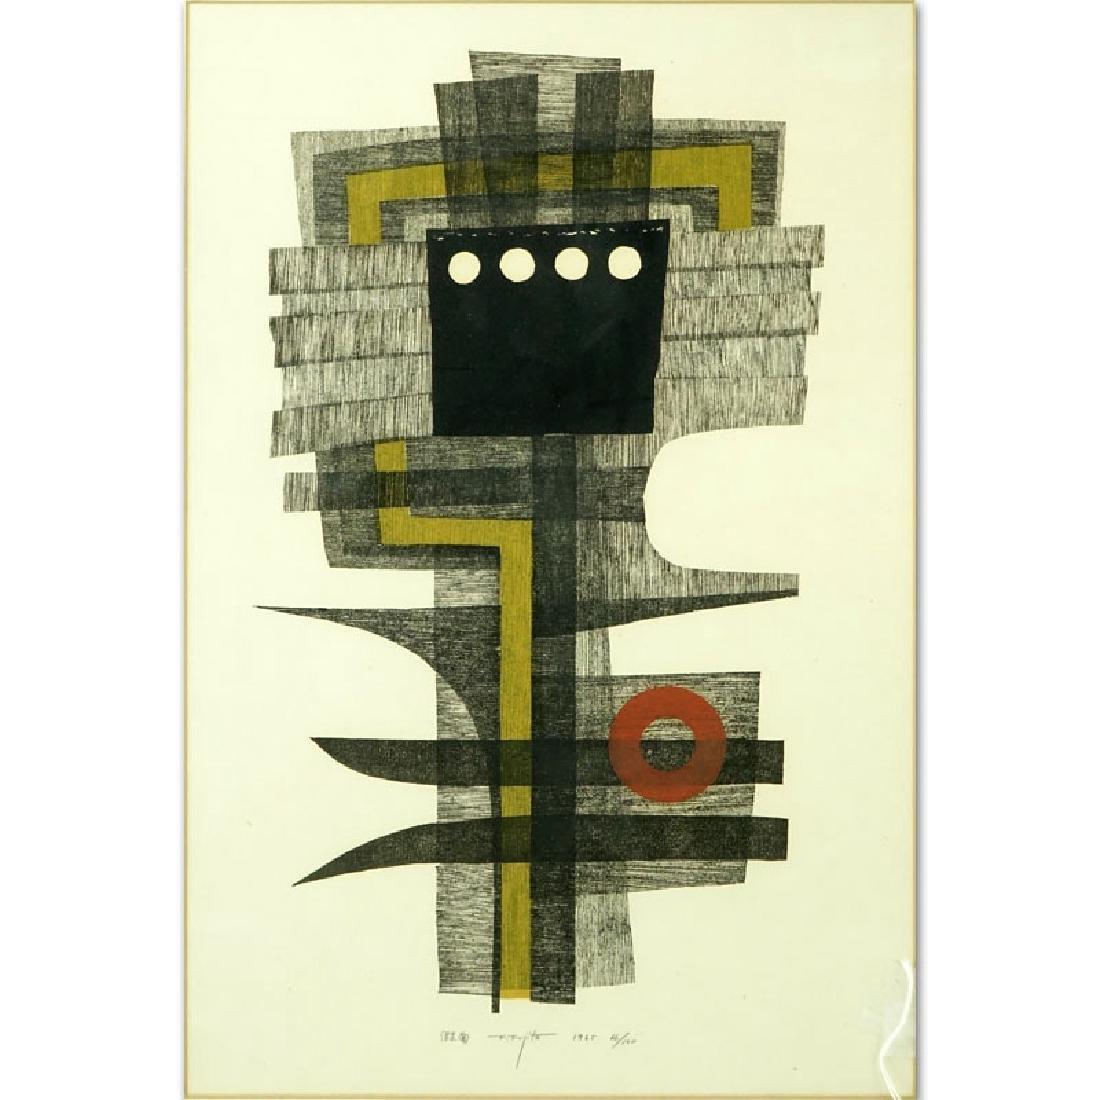 Fumio Fujita, Japanese (b. 1933) Abstract Color